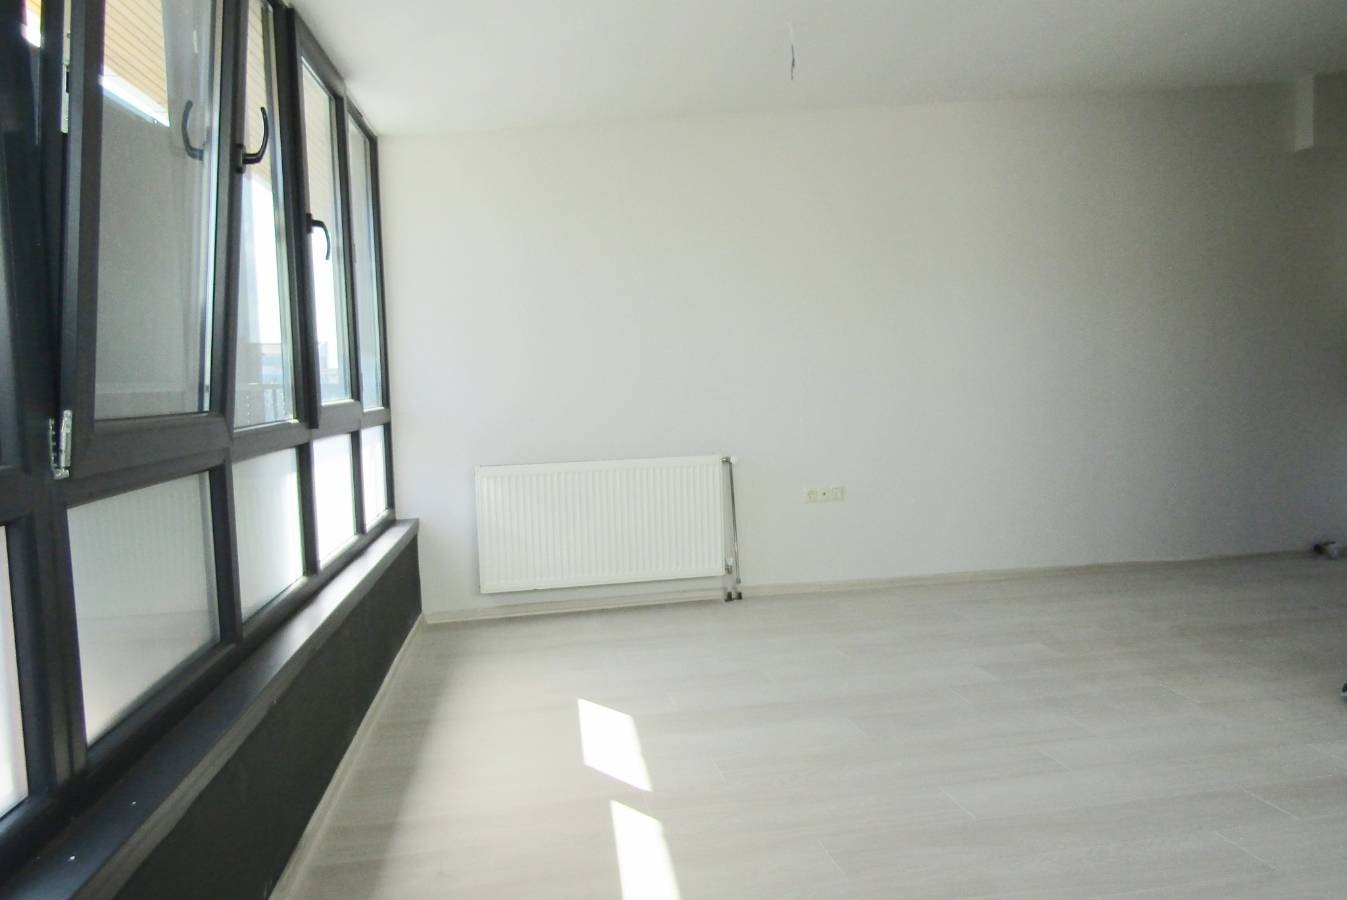 SR EMLAK'TAN KAZIMKARABEKİR MAH'DE 2+1 85m² BAĞIMSIZ OFİS